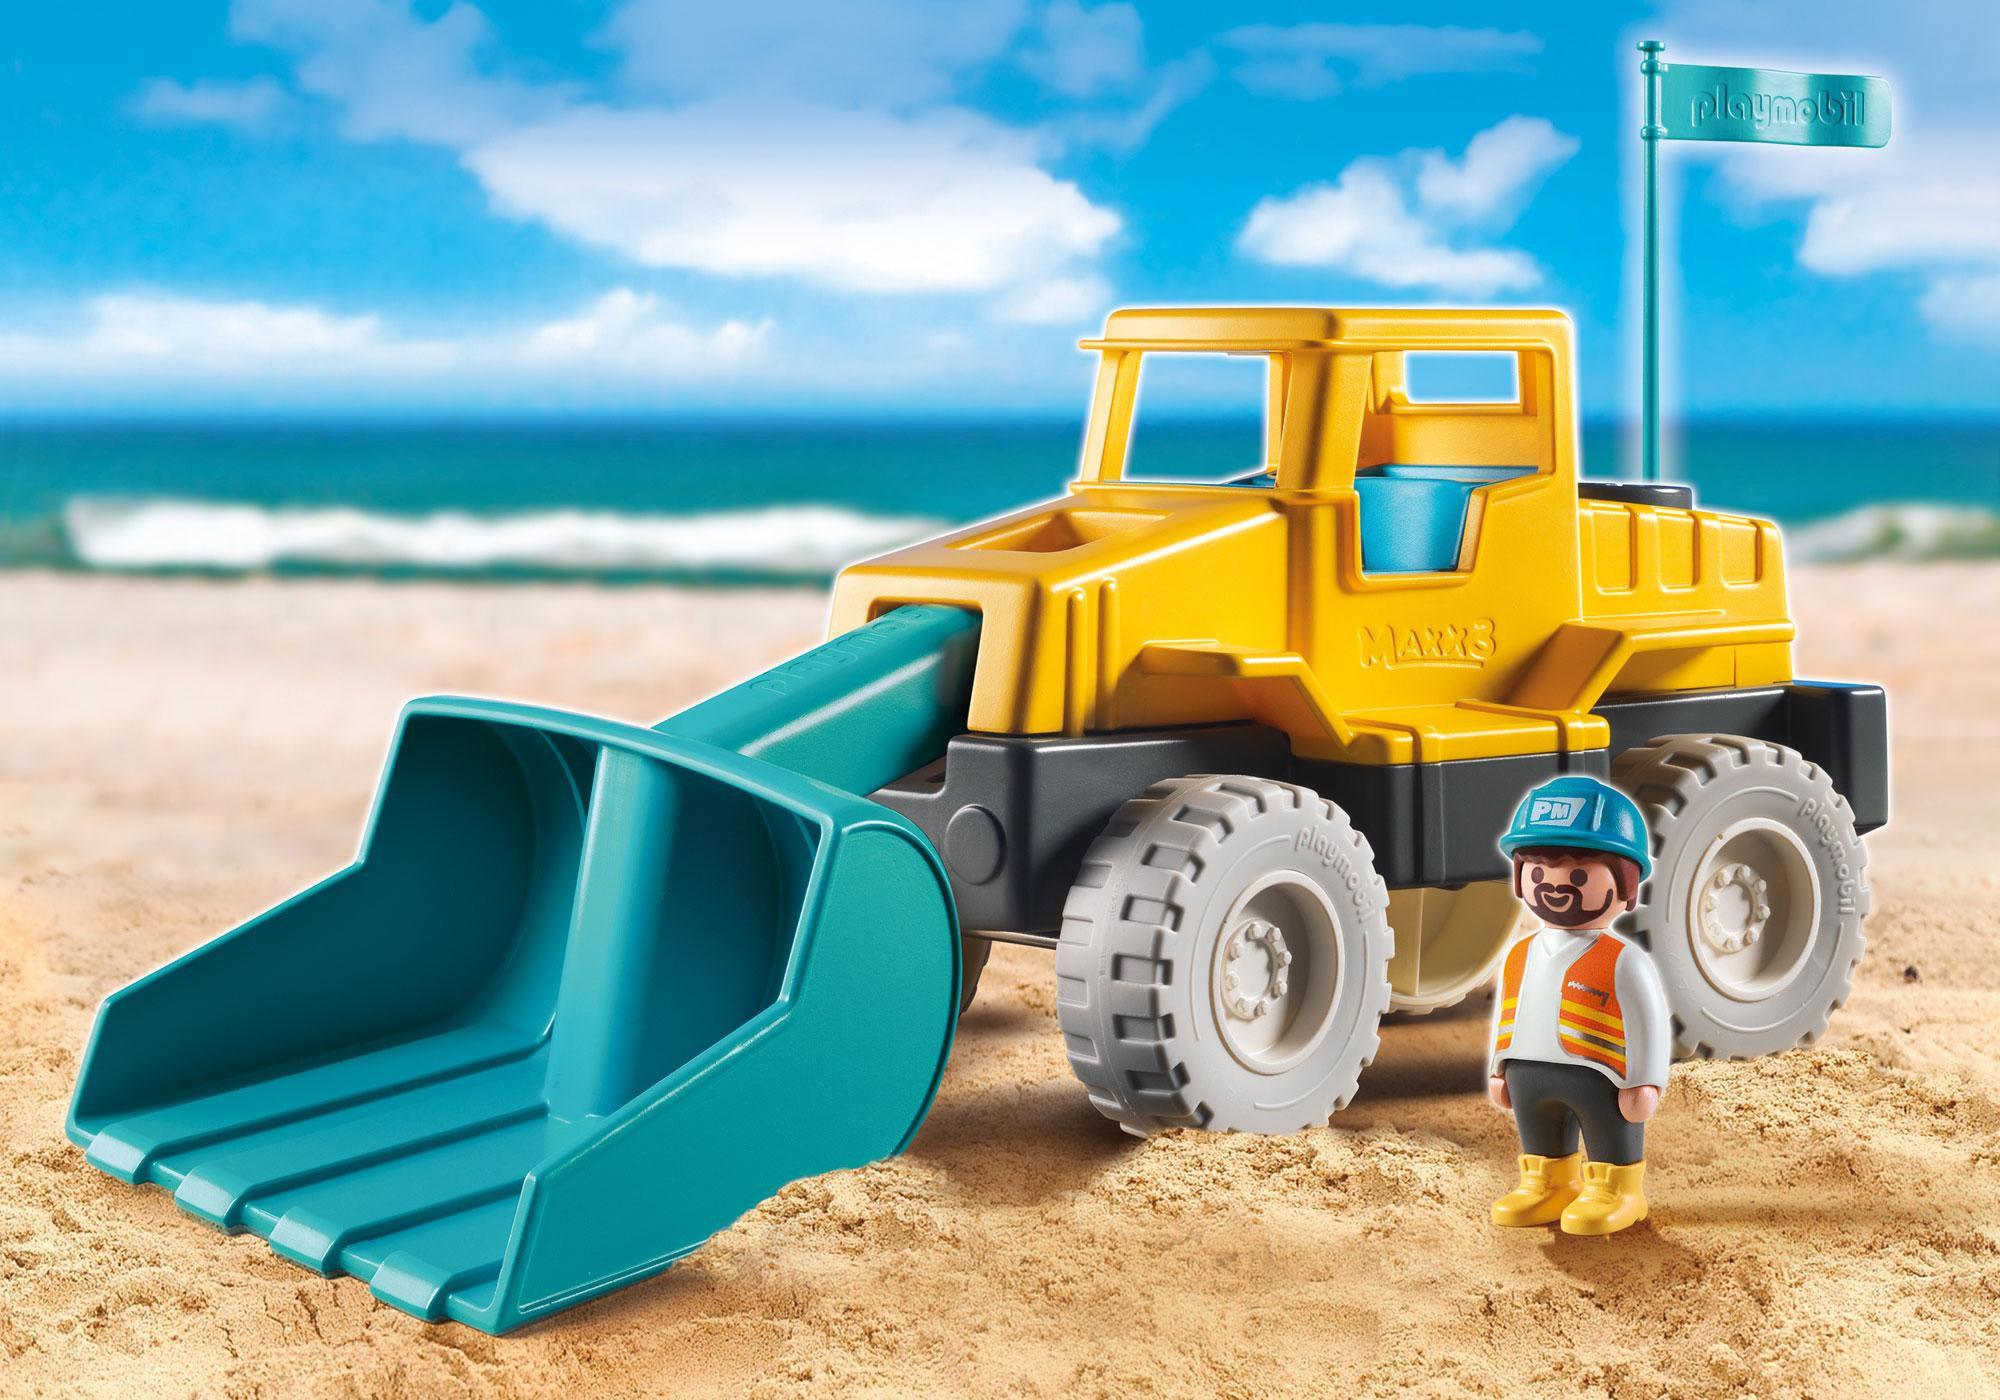 http://media.playmobil.com/i/playmobil/9145_product_detail/Graafmachine met schep